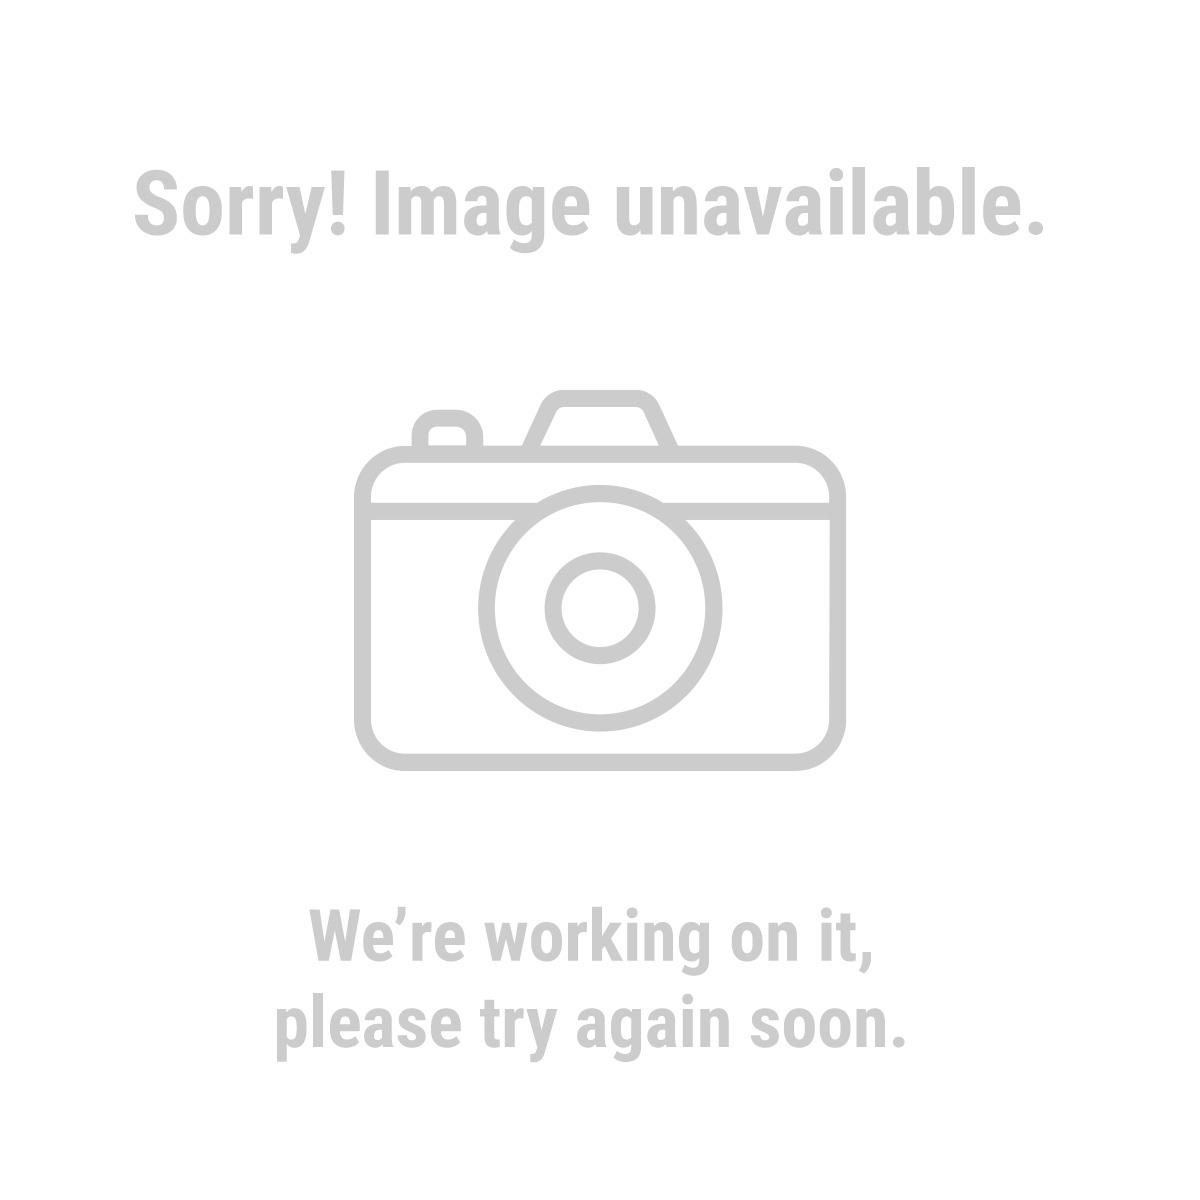 Haul-Master® 69650 Truck Bed Extender